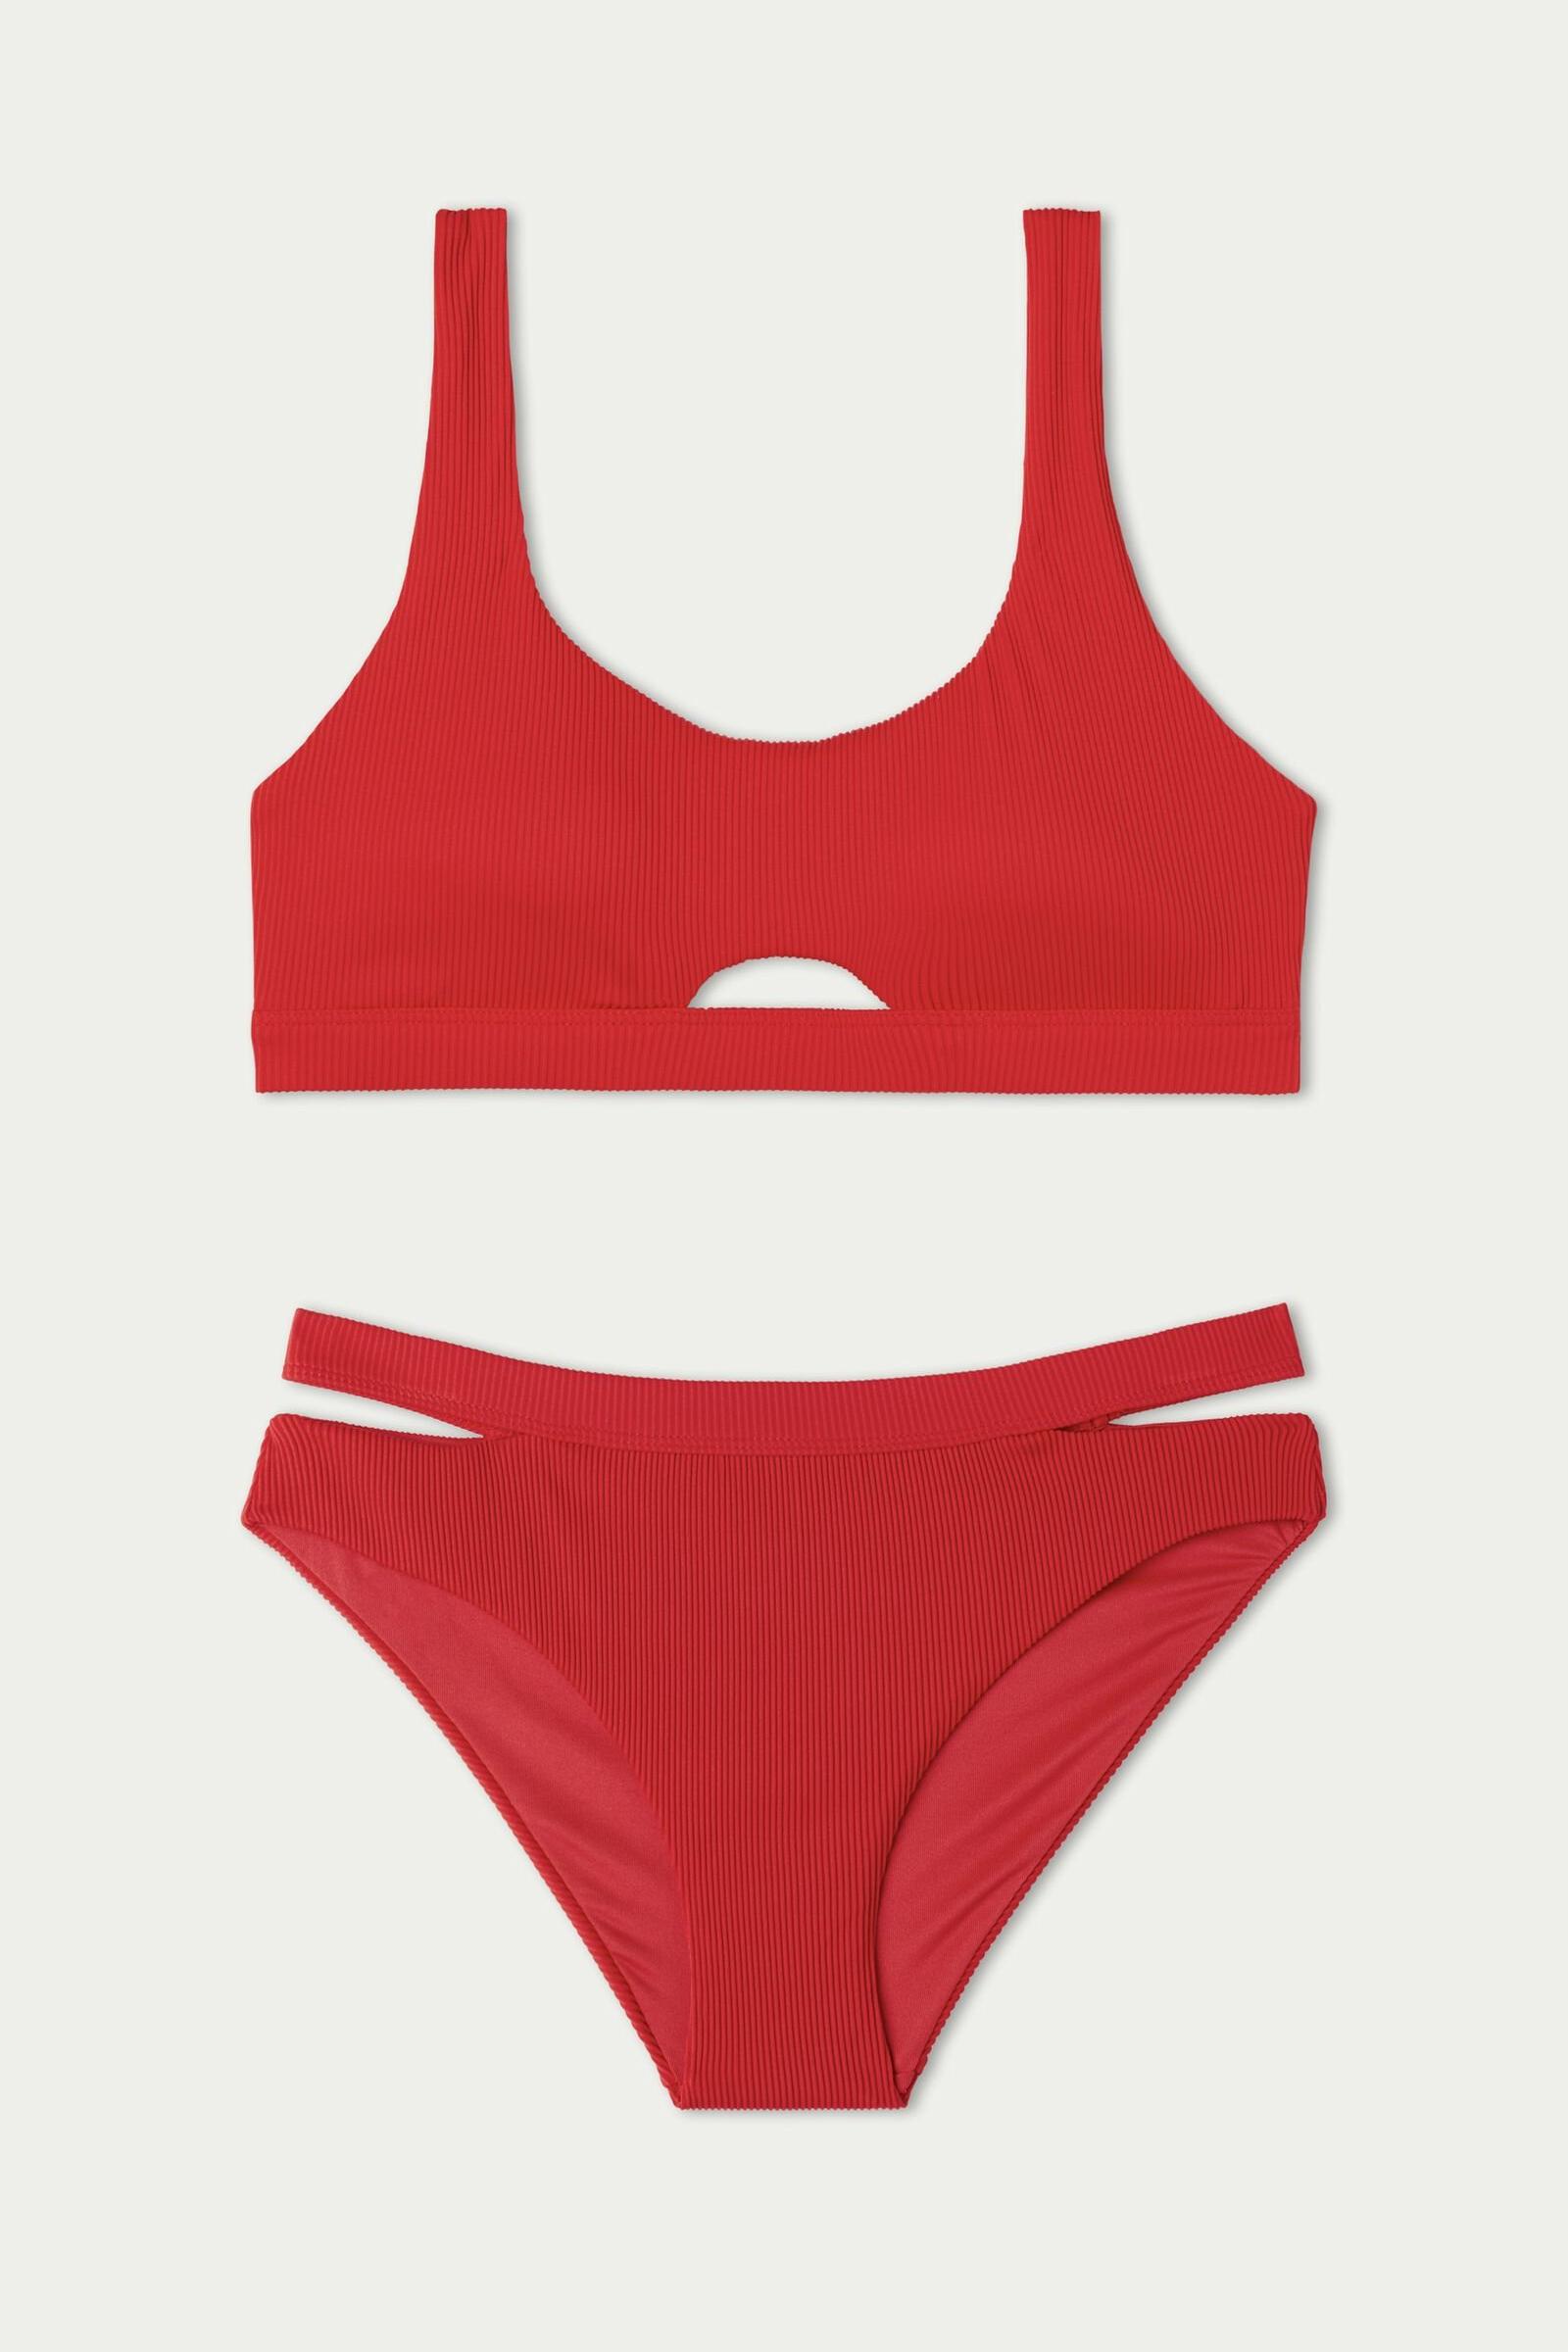 Tezenis cutout bikini